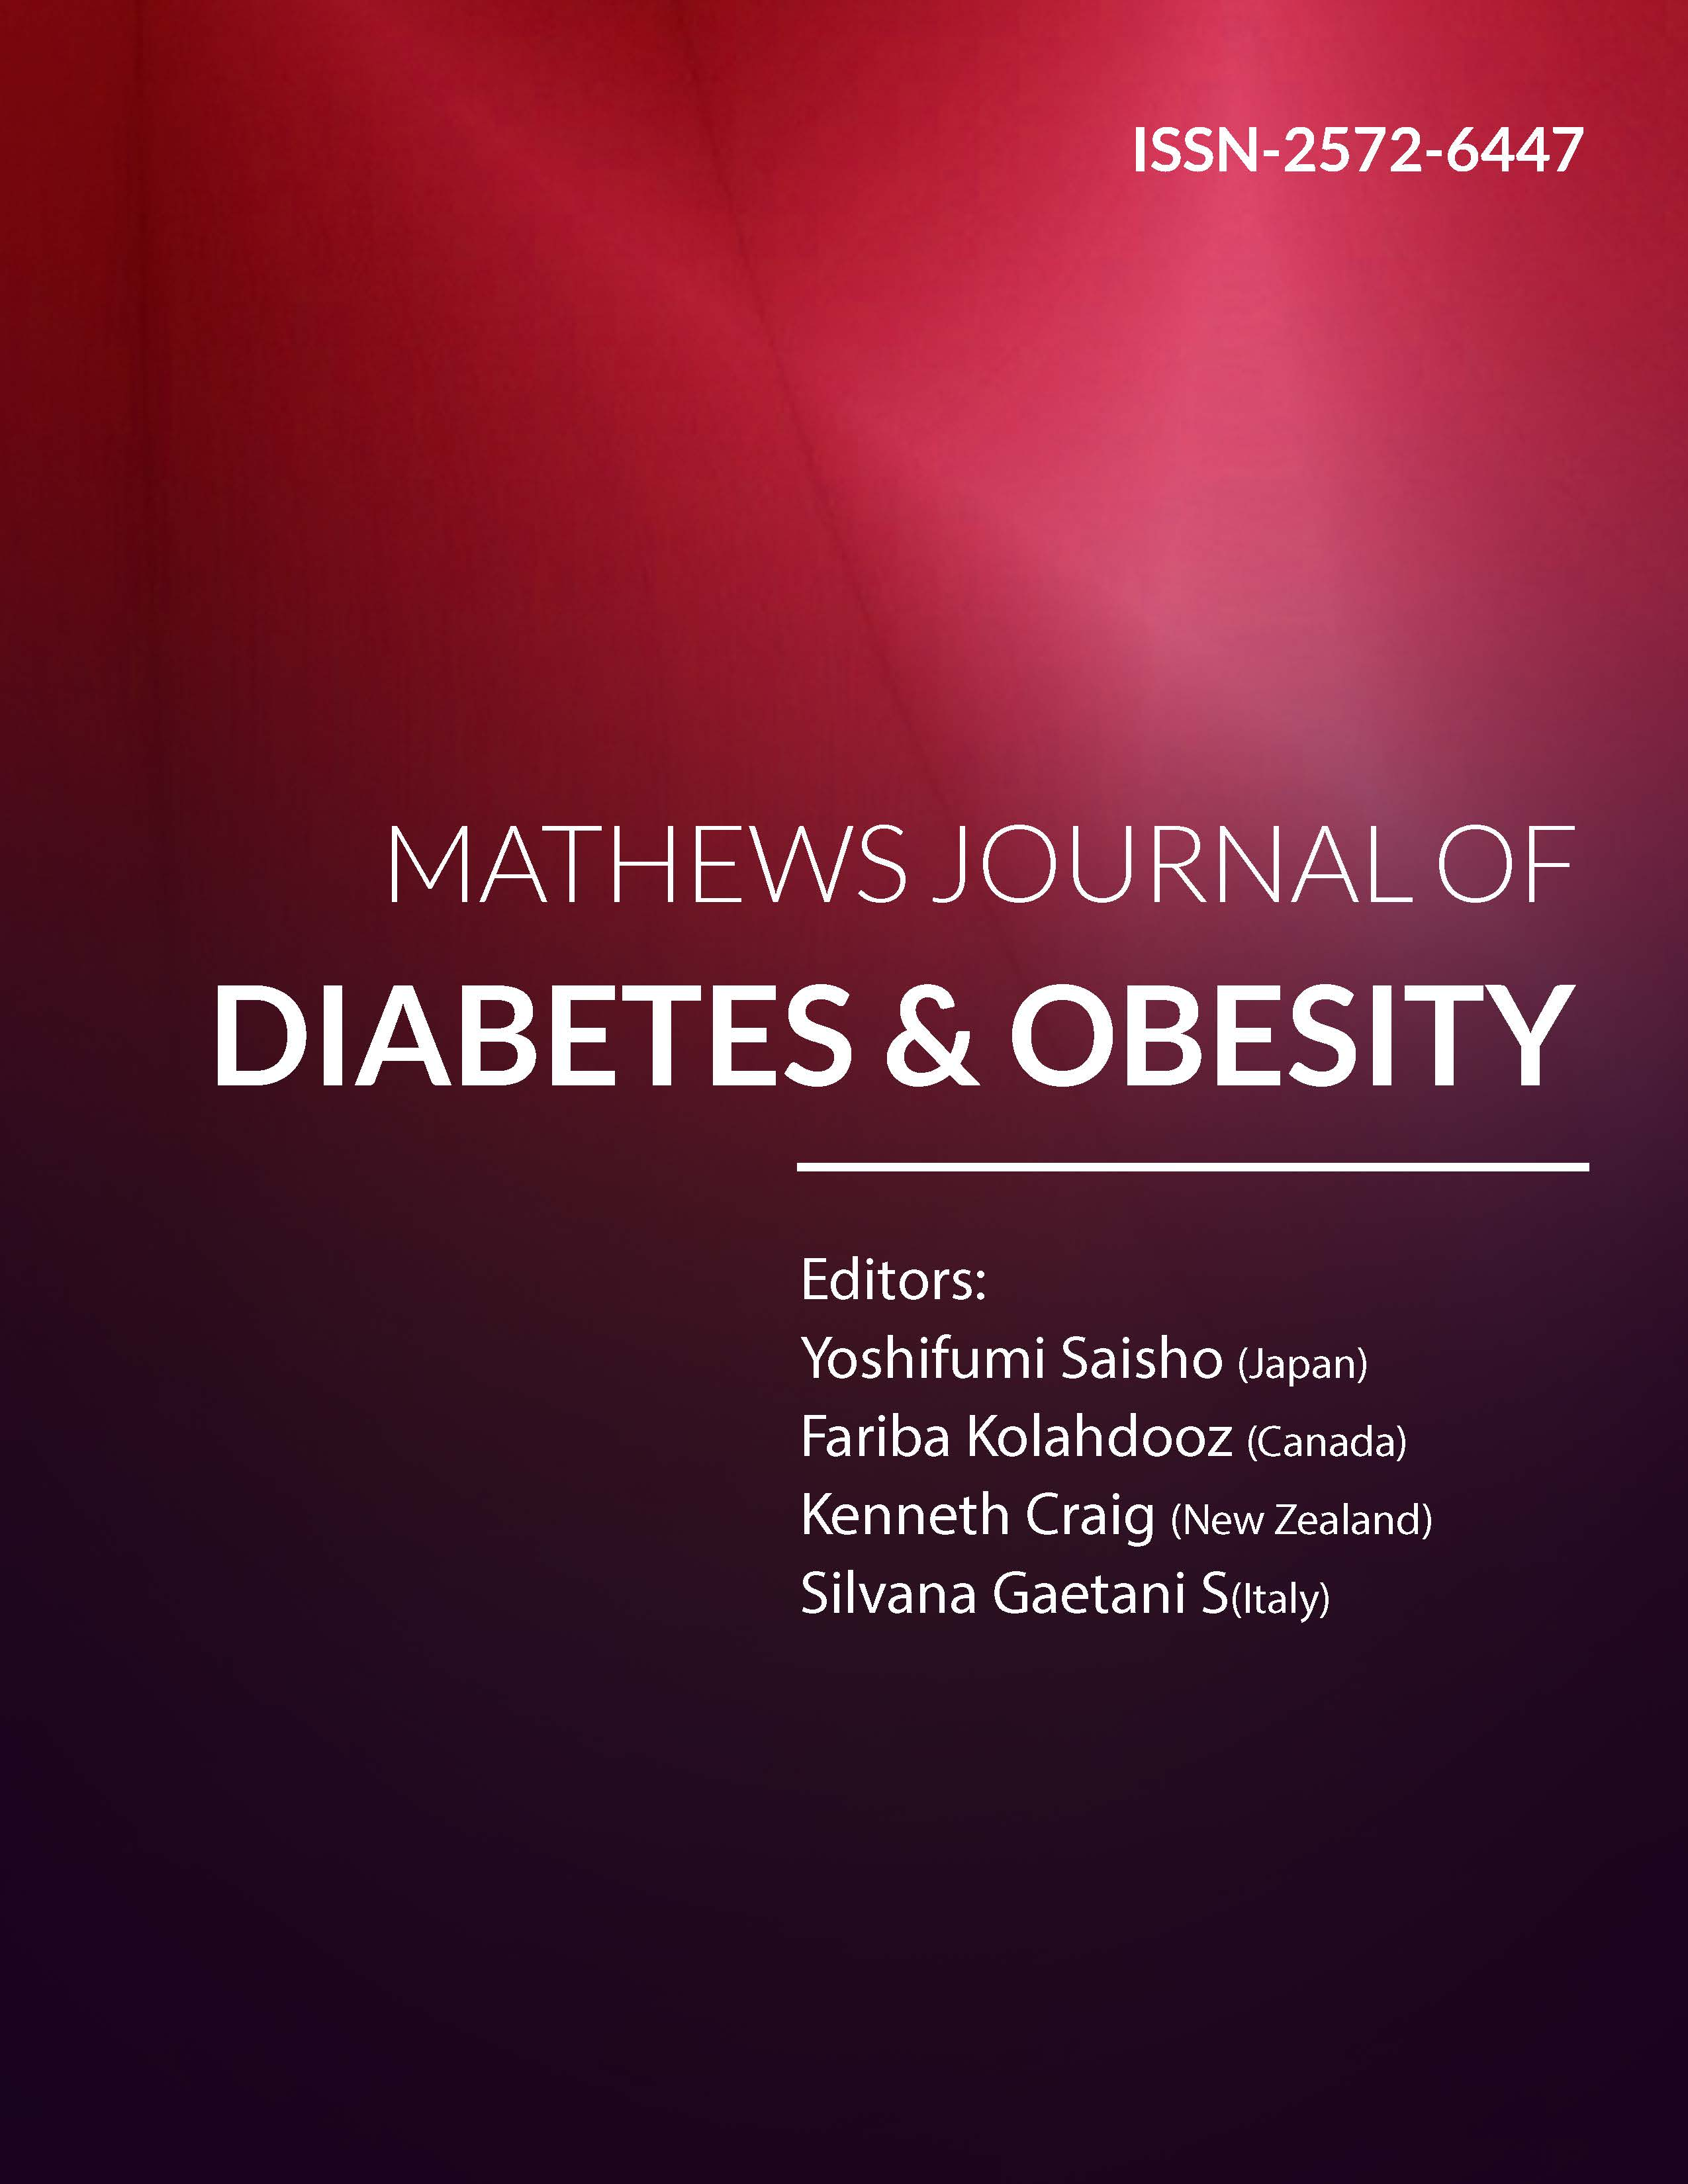 Mathews Journal of Diabetes & Obesity